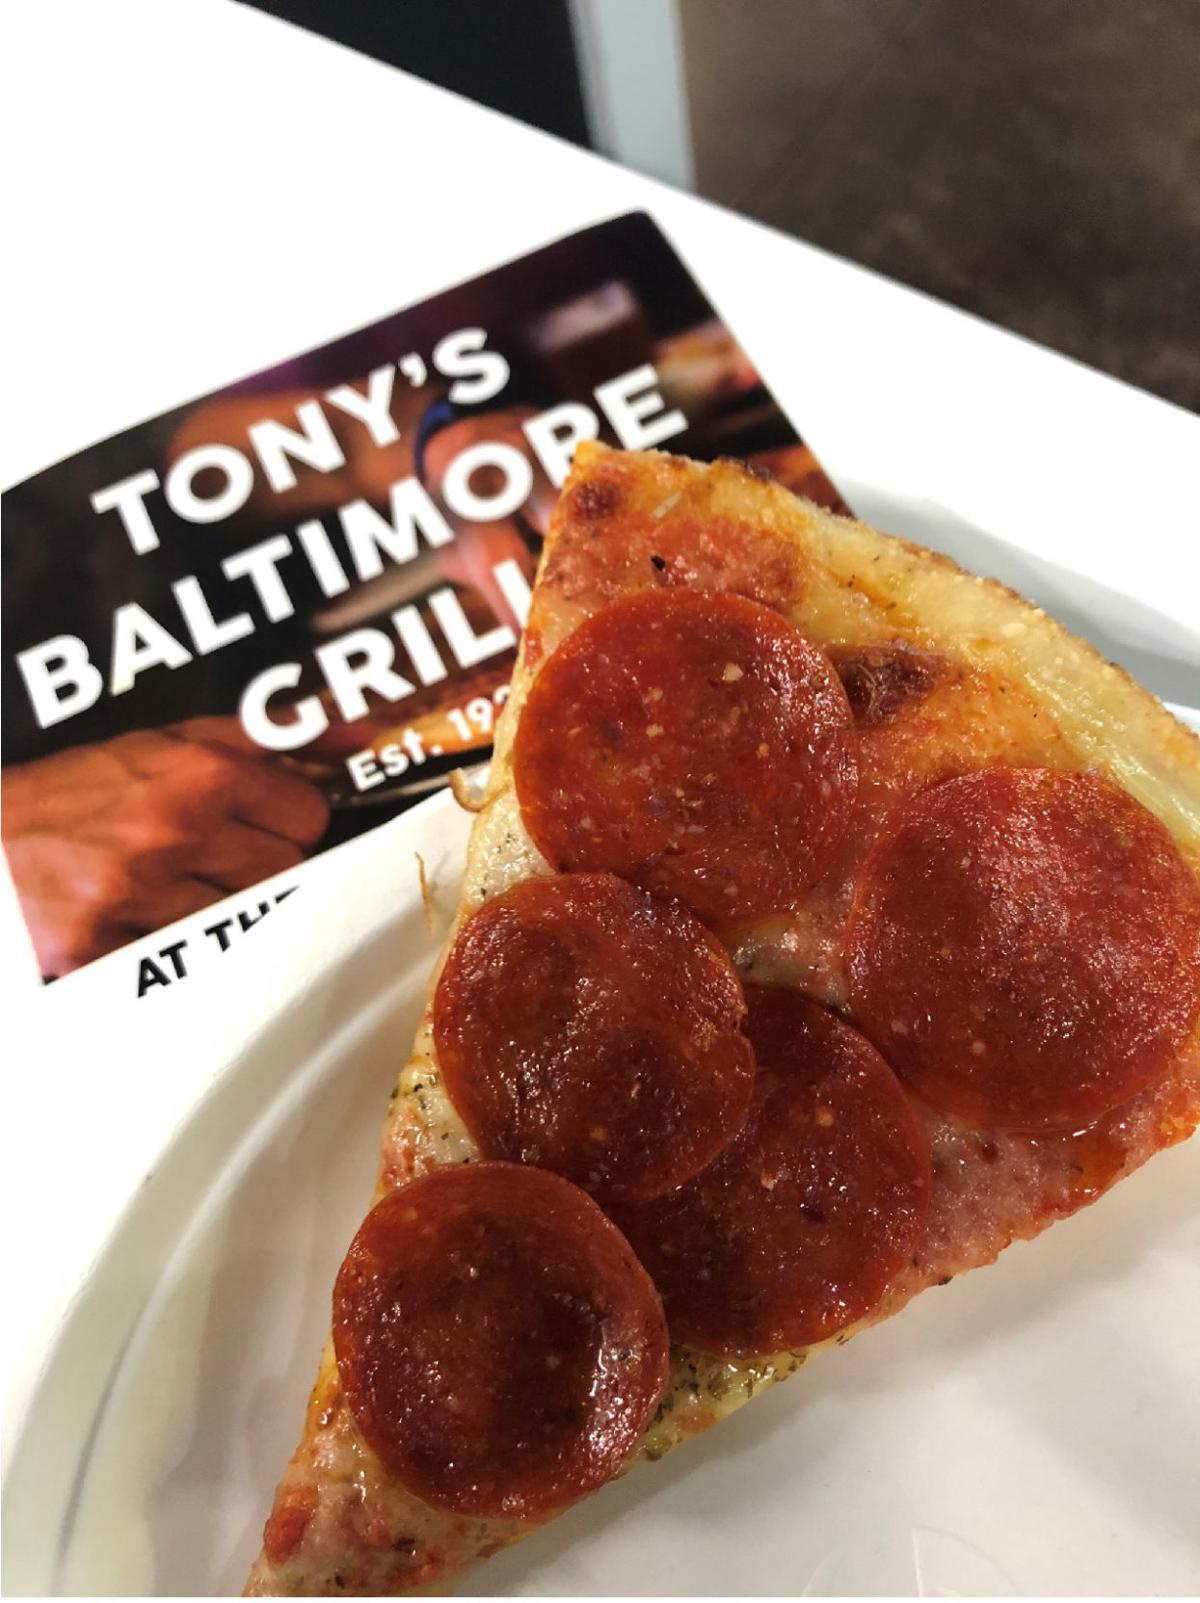 Tony's Baltimore Grill_AC_Pizza.jpg